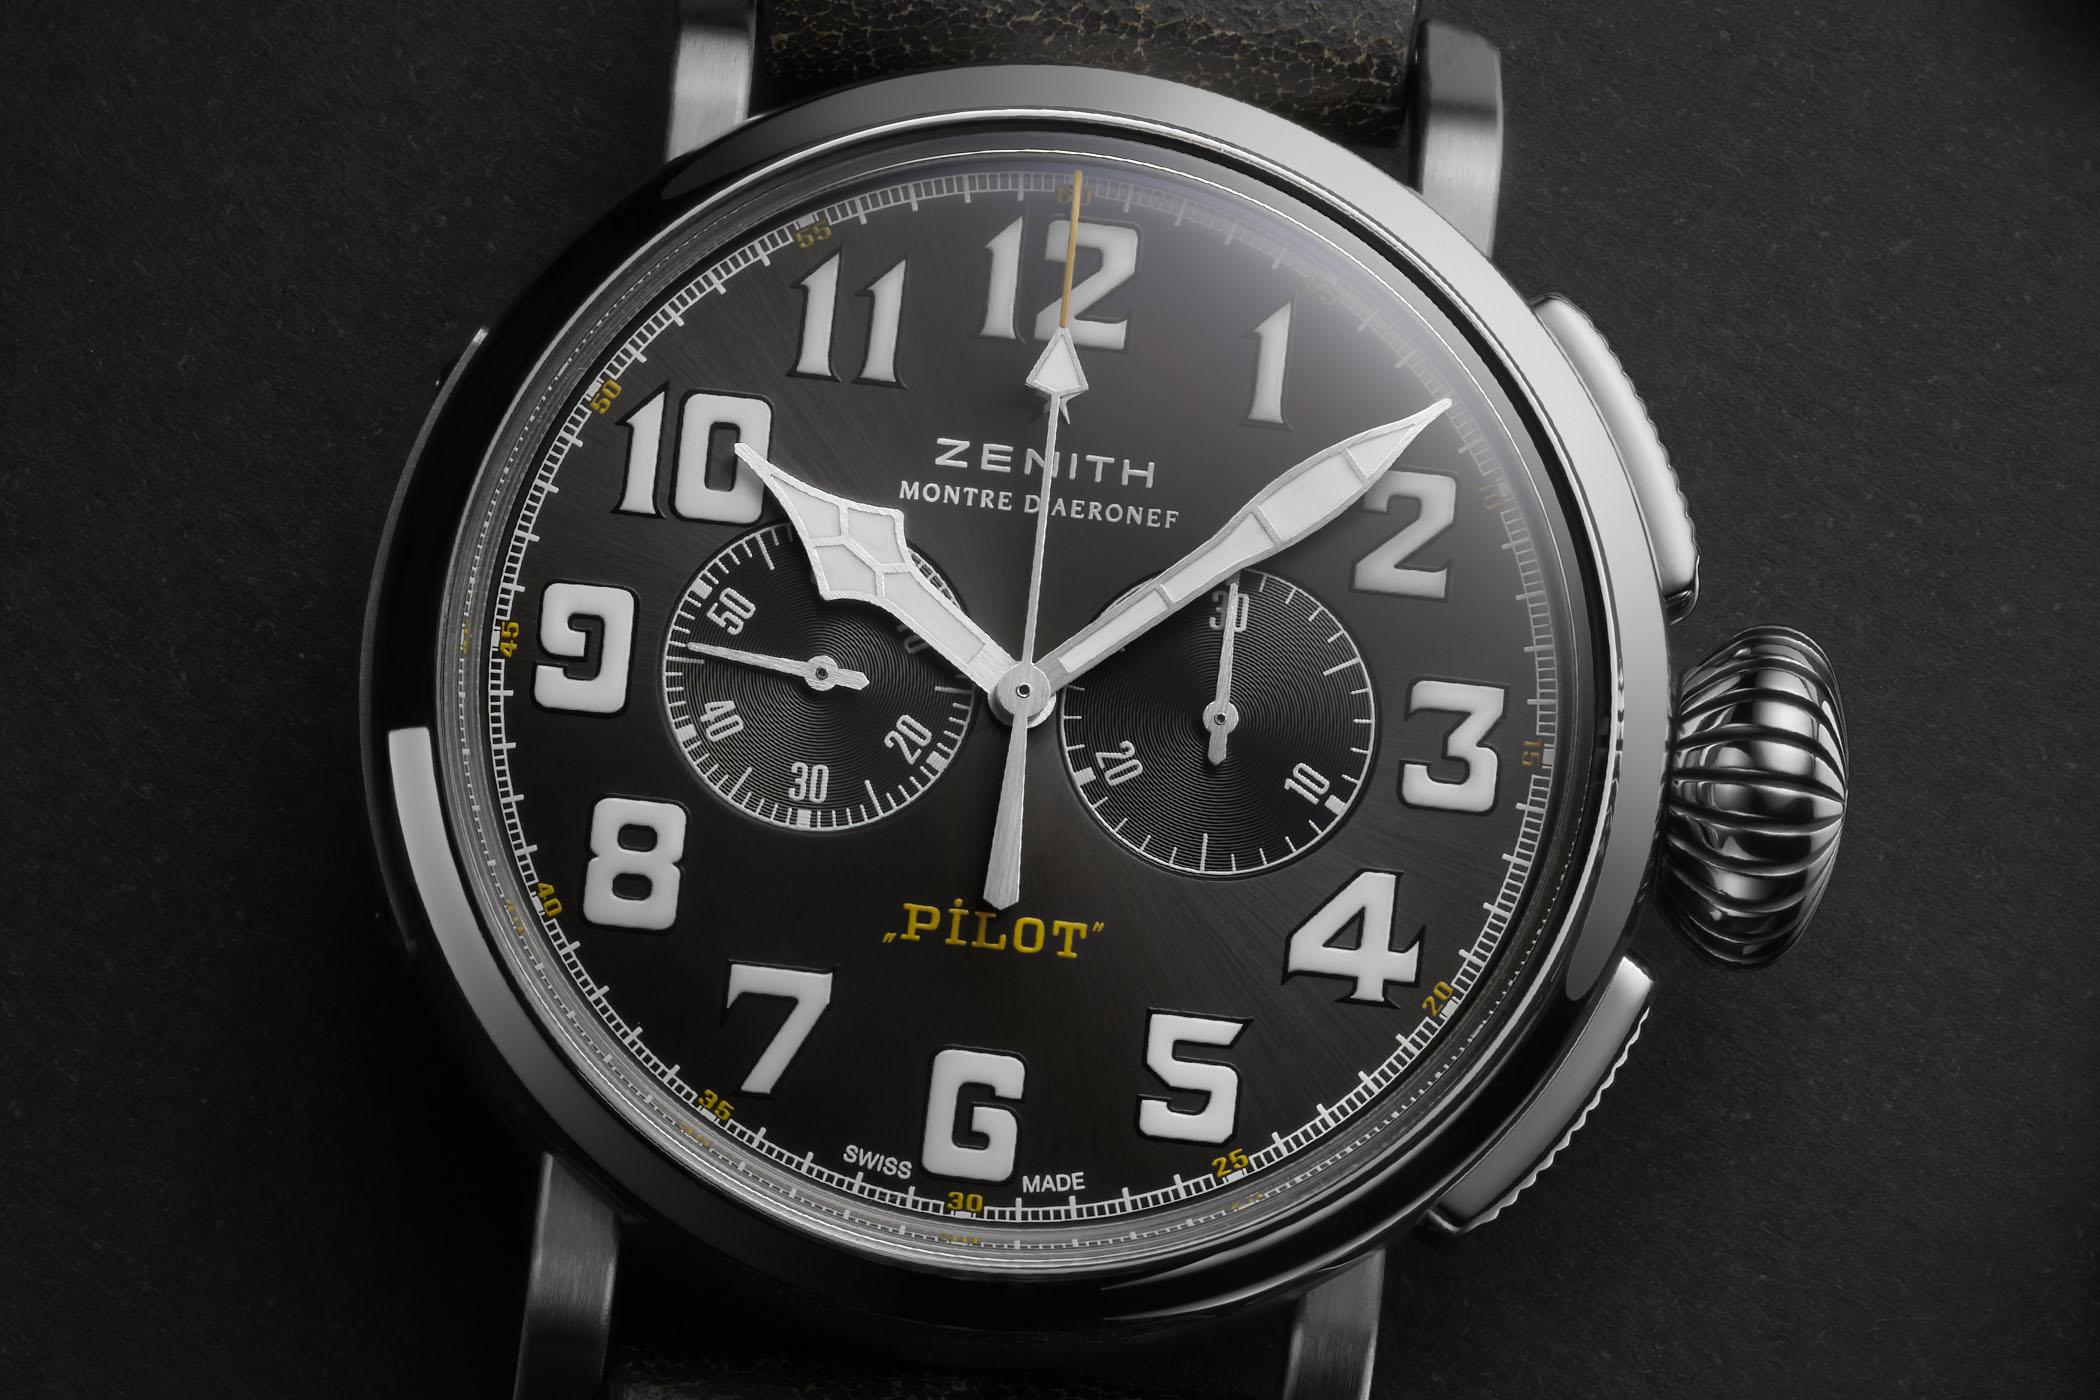 Zenith Pilot Type 20 Rescue Chronograph